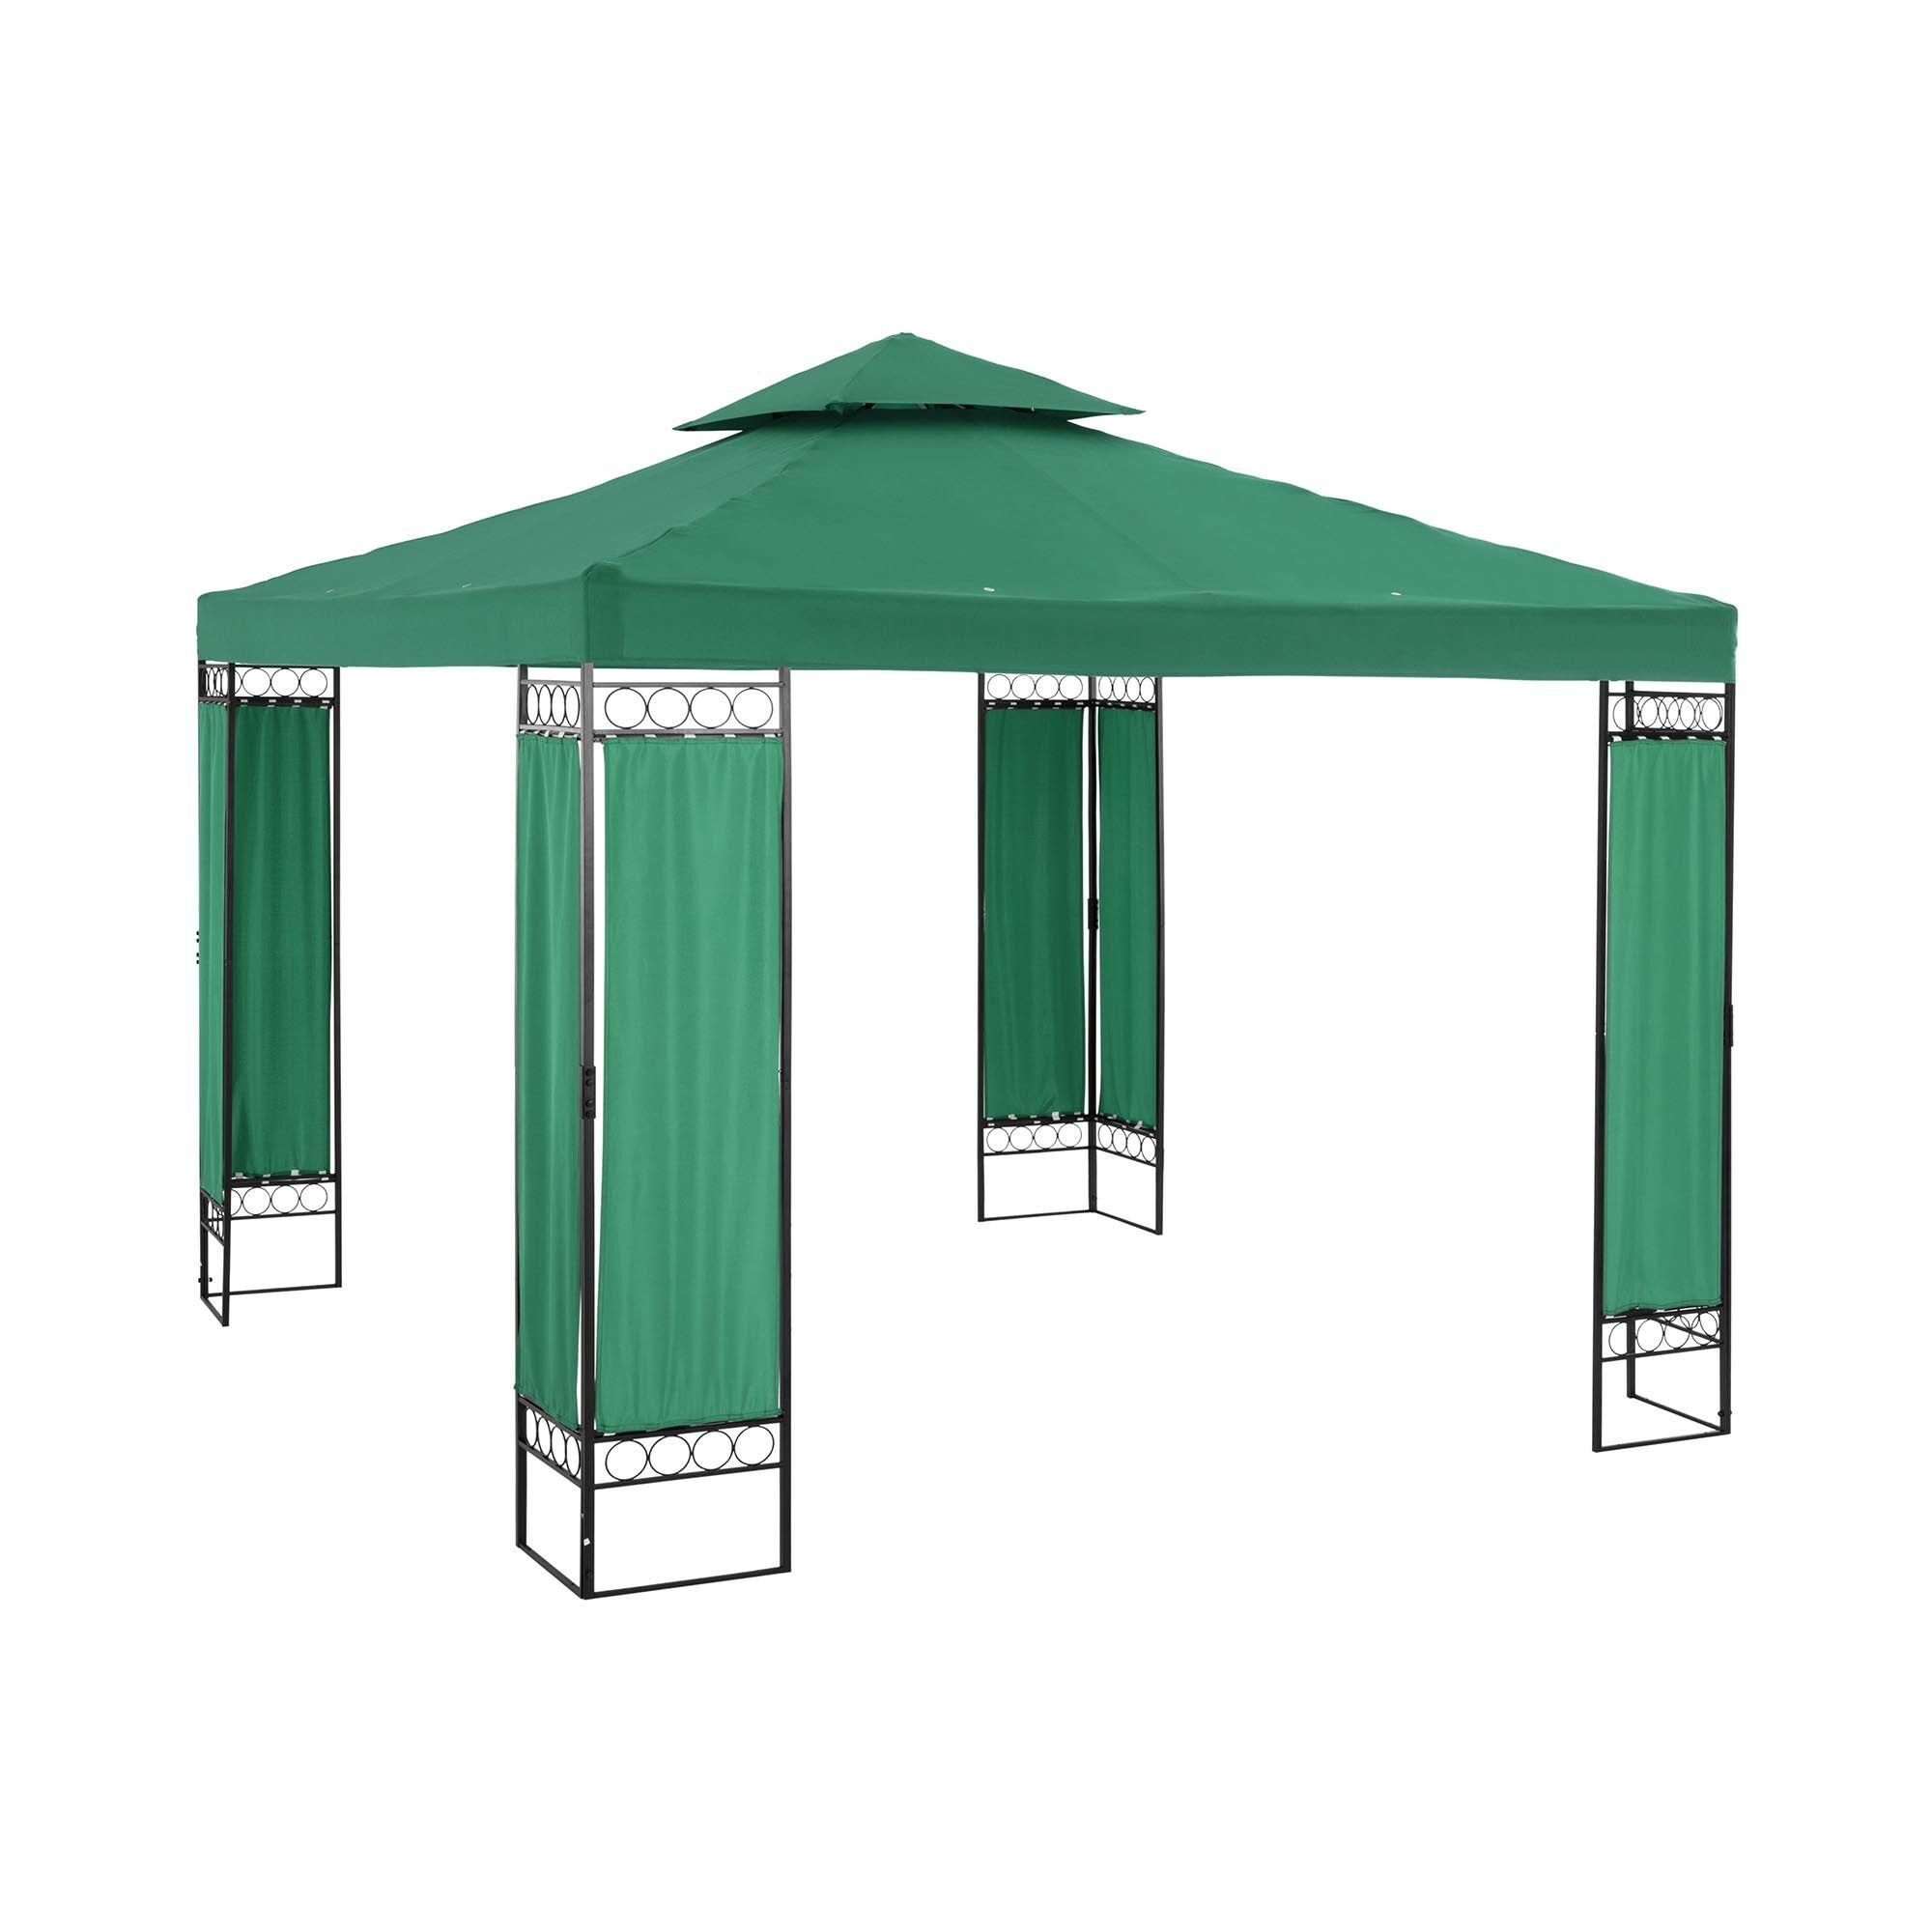 uniprodo gazebo da gardino - 3 x 3 m - 160 g/m² - verde scuro uni_pergola_3x3gf